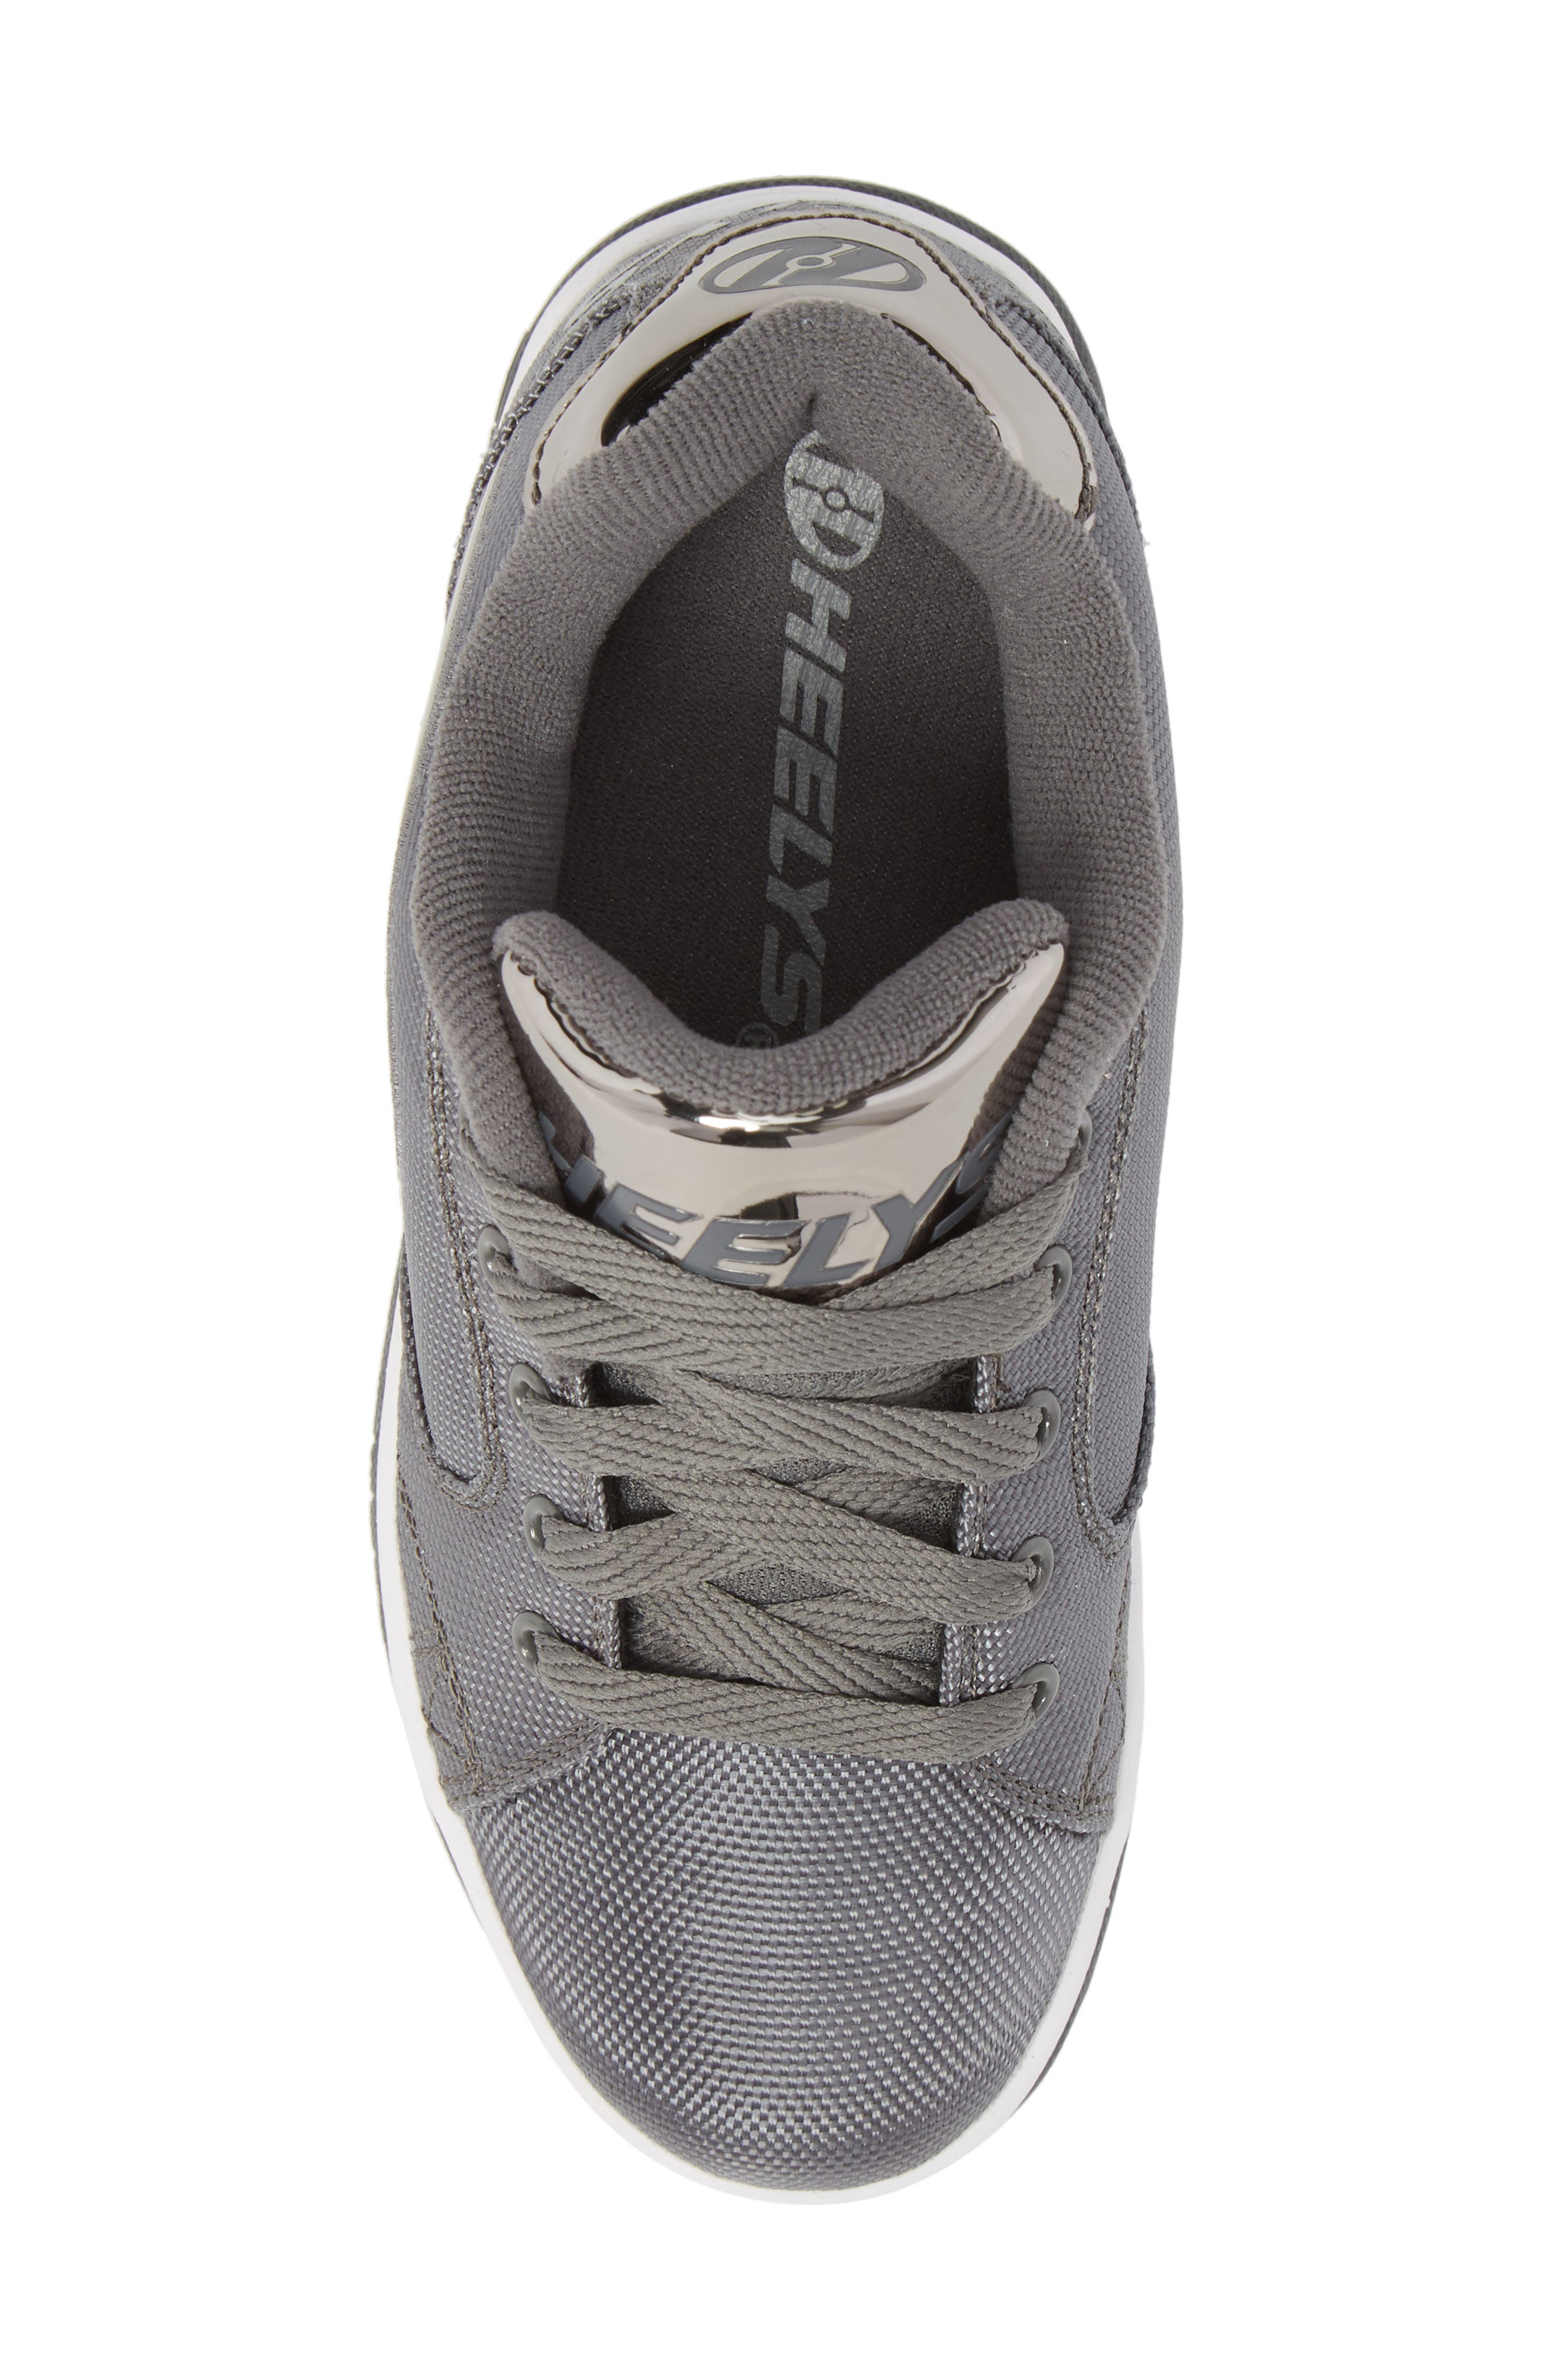 Heels Propel Ballistic Sneaker,                             Alternate thumbnail 5, color,                             Charcoal/ Pewter